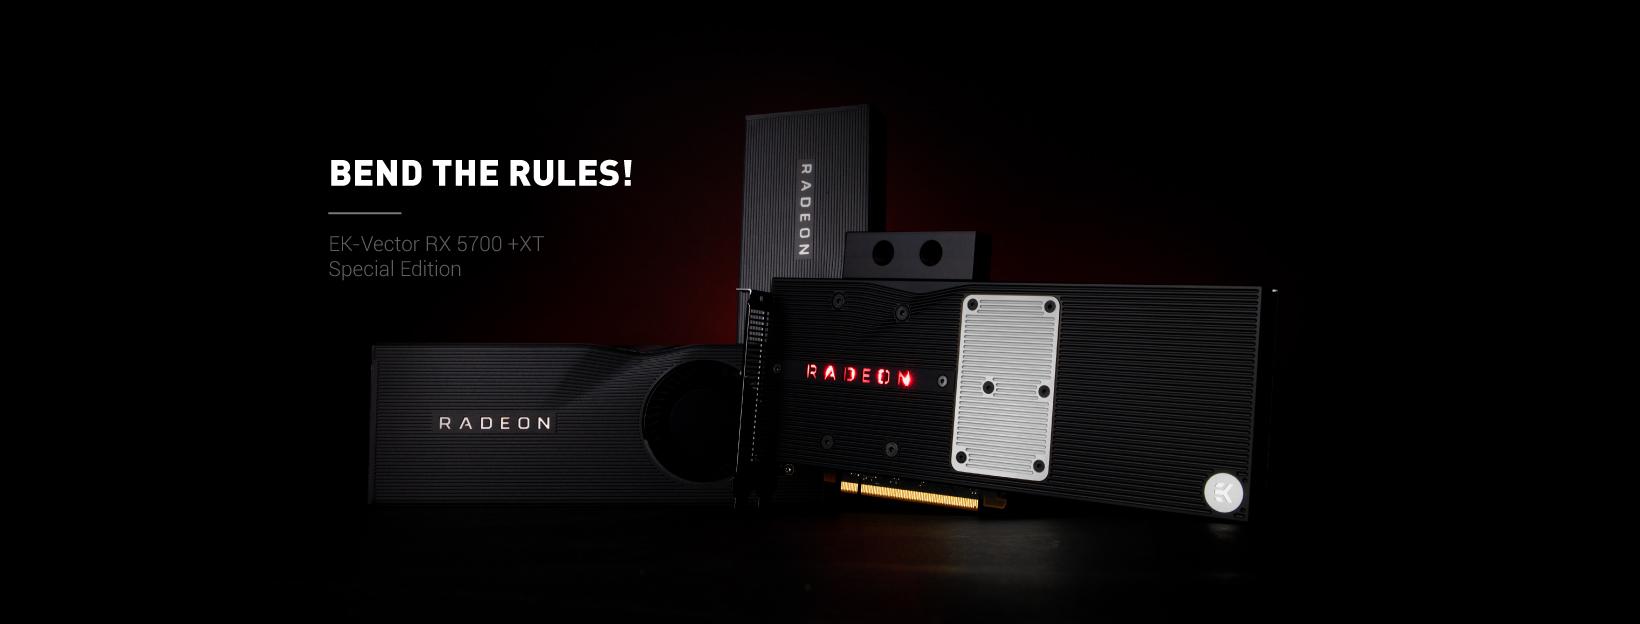 P-0234_EKint_EK-Vector Radeon RX 5700 +XT D-RGB AMD Special-Edition_Facebook_CoverRK.V1